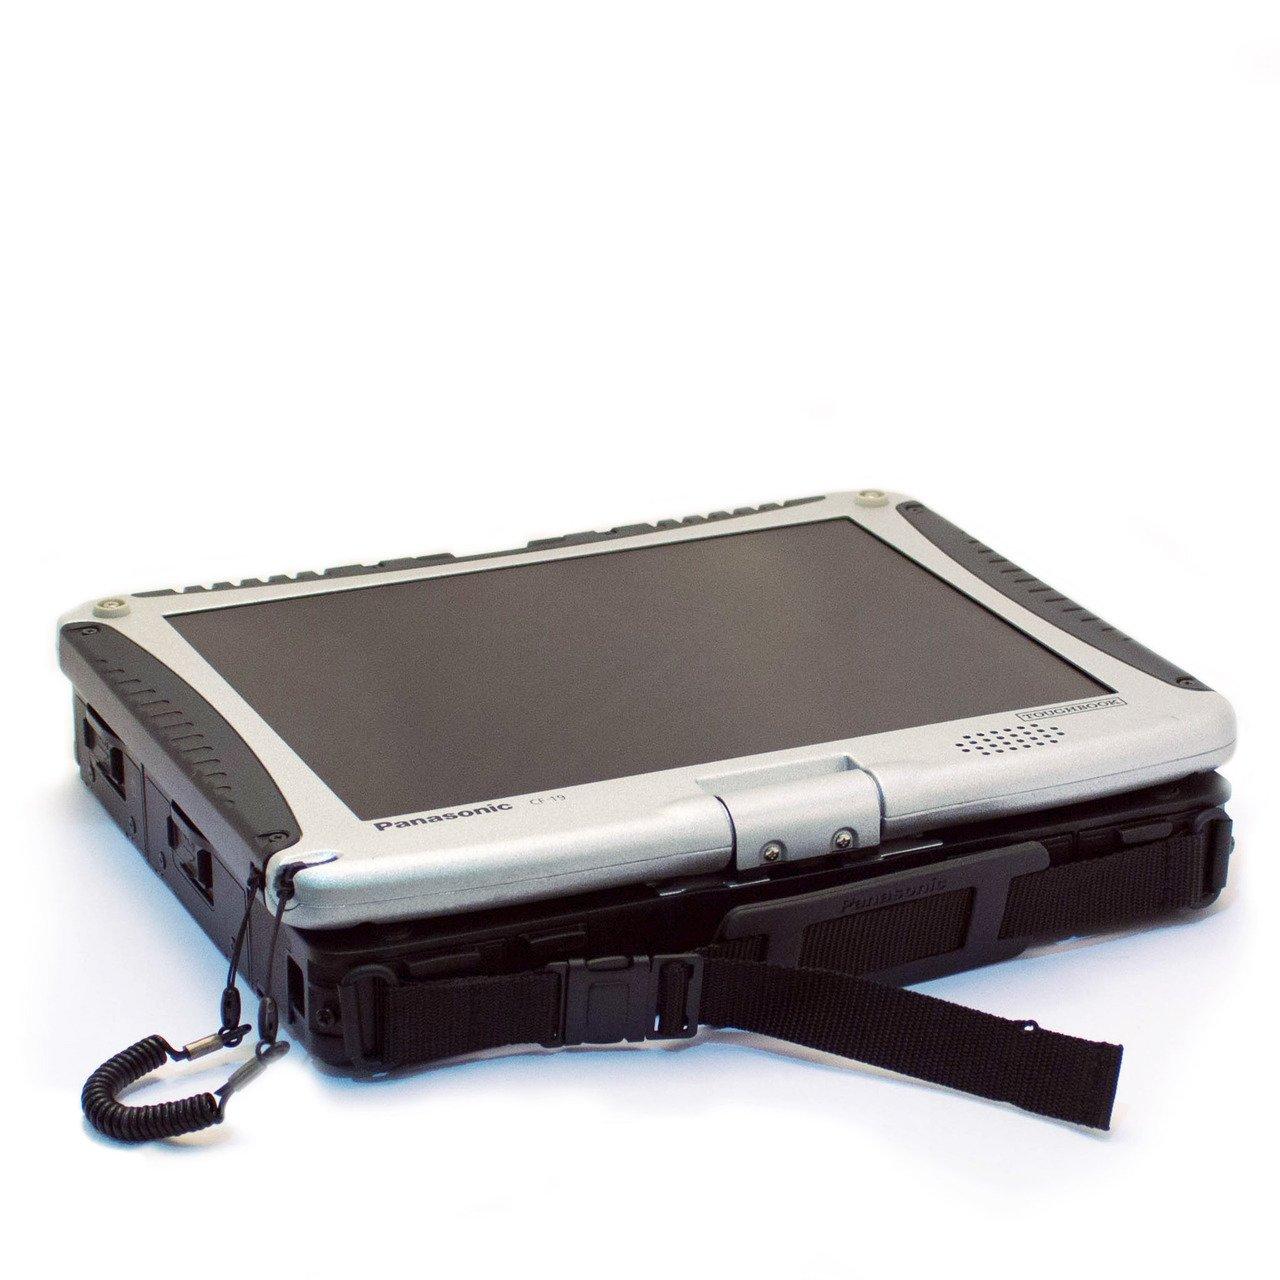 "Laptop Panasonic Toughbook CF-19 MK7, Intel Core i5 3340M 2.7 GHz, WI-FI, Bluetooth, Display 10,4"" 1024 by 768 Touchscreen, 4 GB DDR3; 320 GB HDD SATA, Second Hand - imaginea 5"